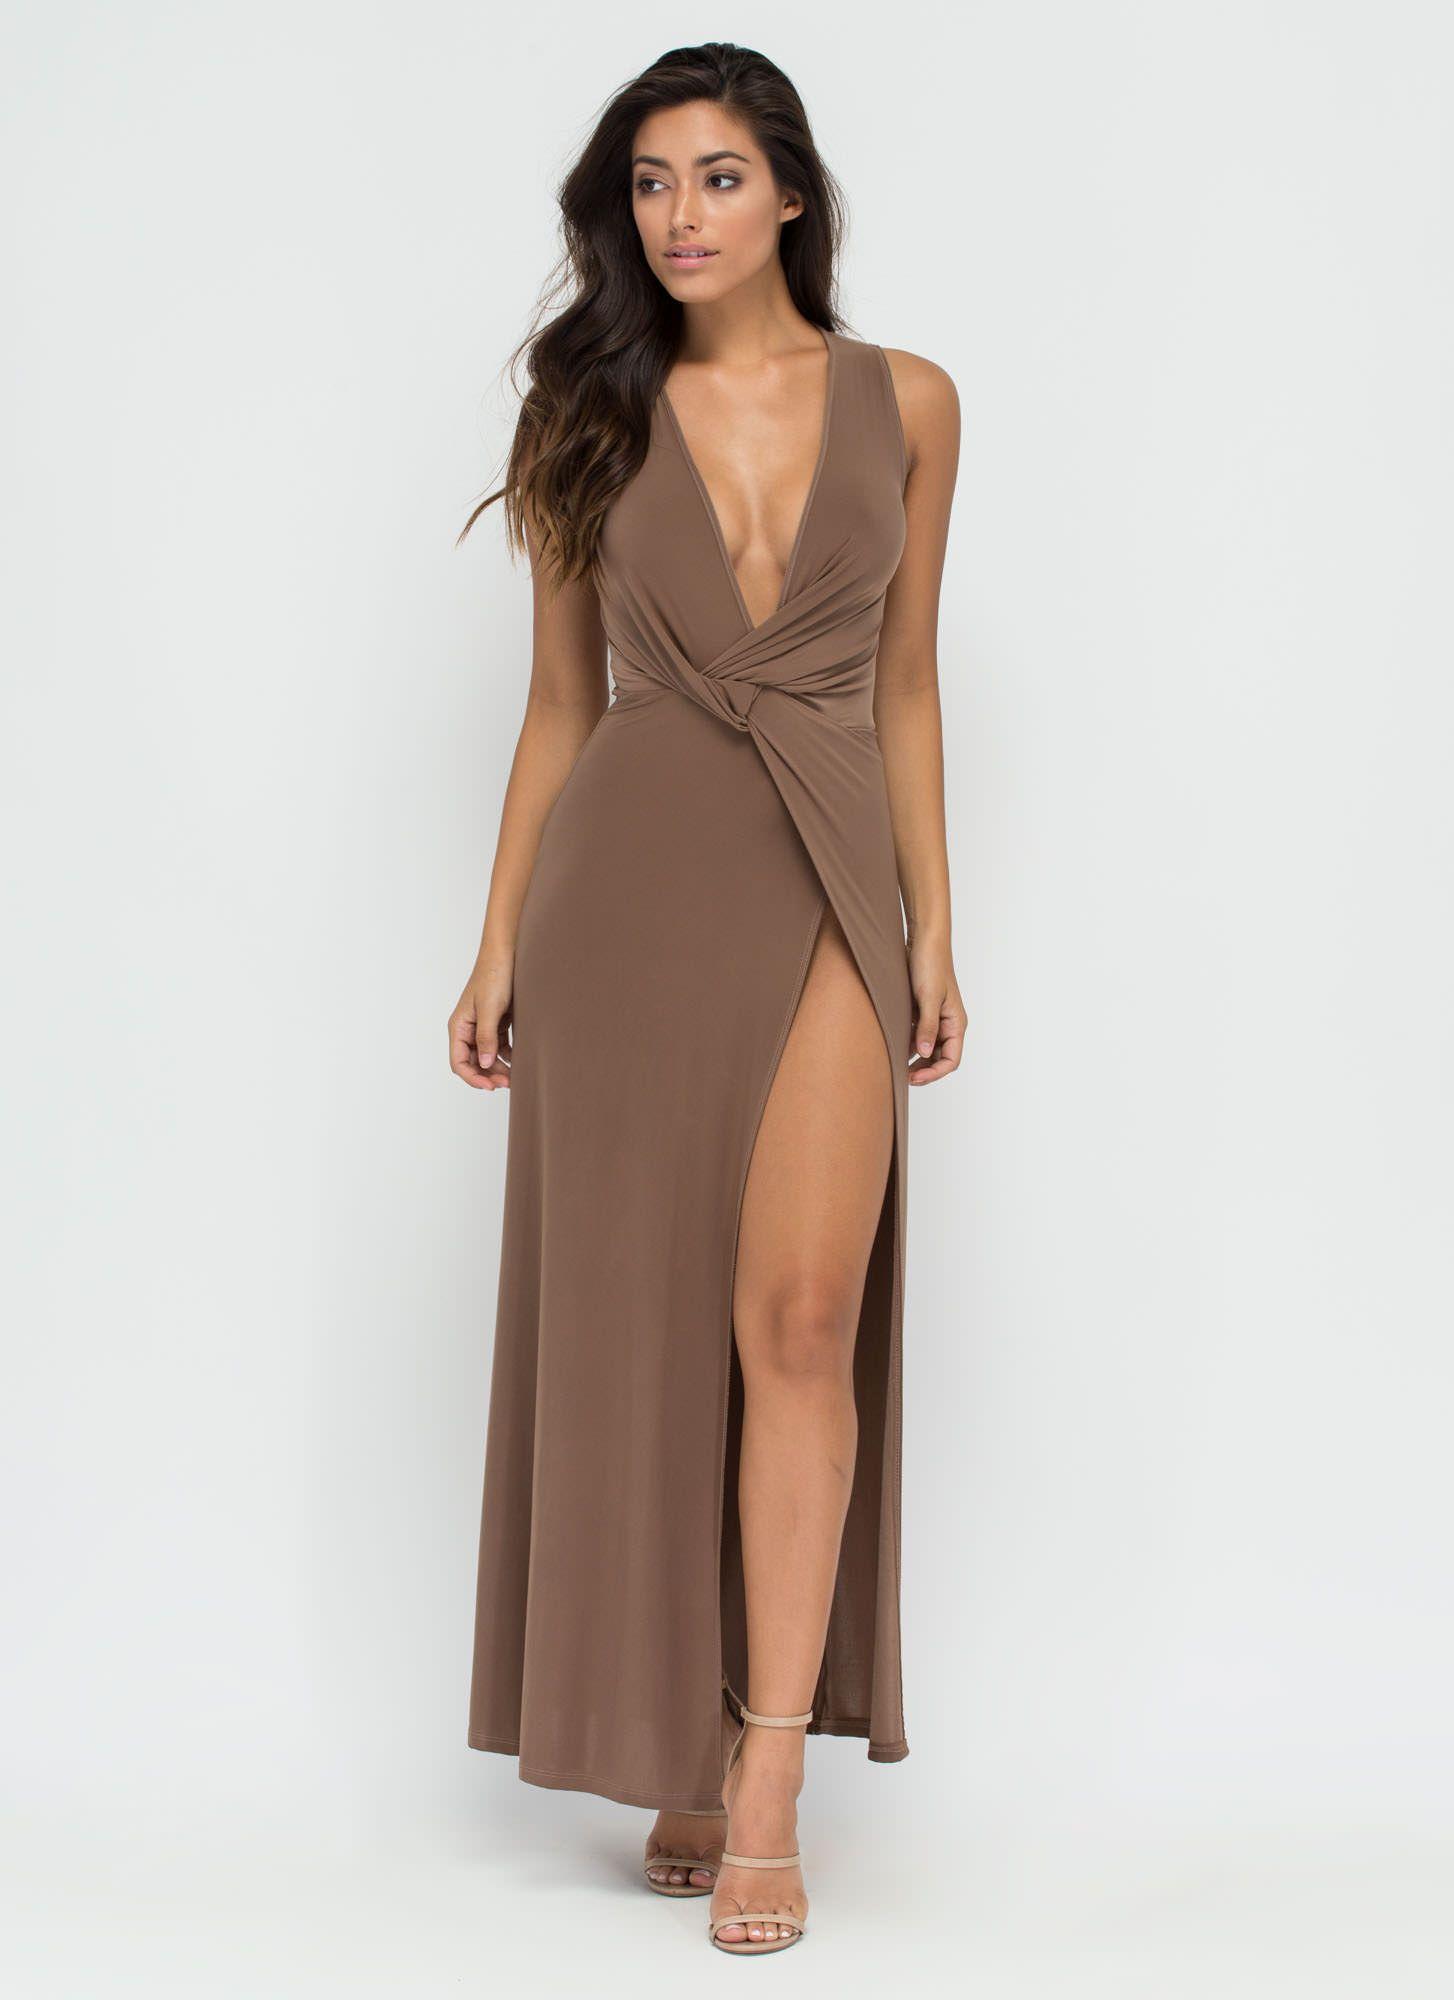 Knot your maxi dress